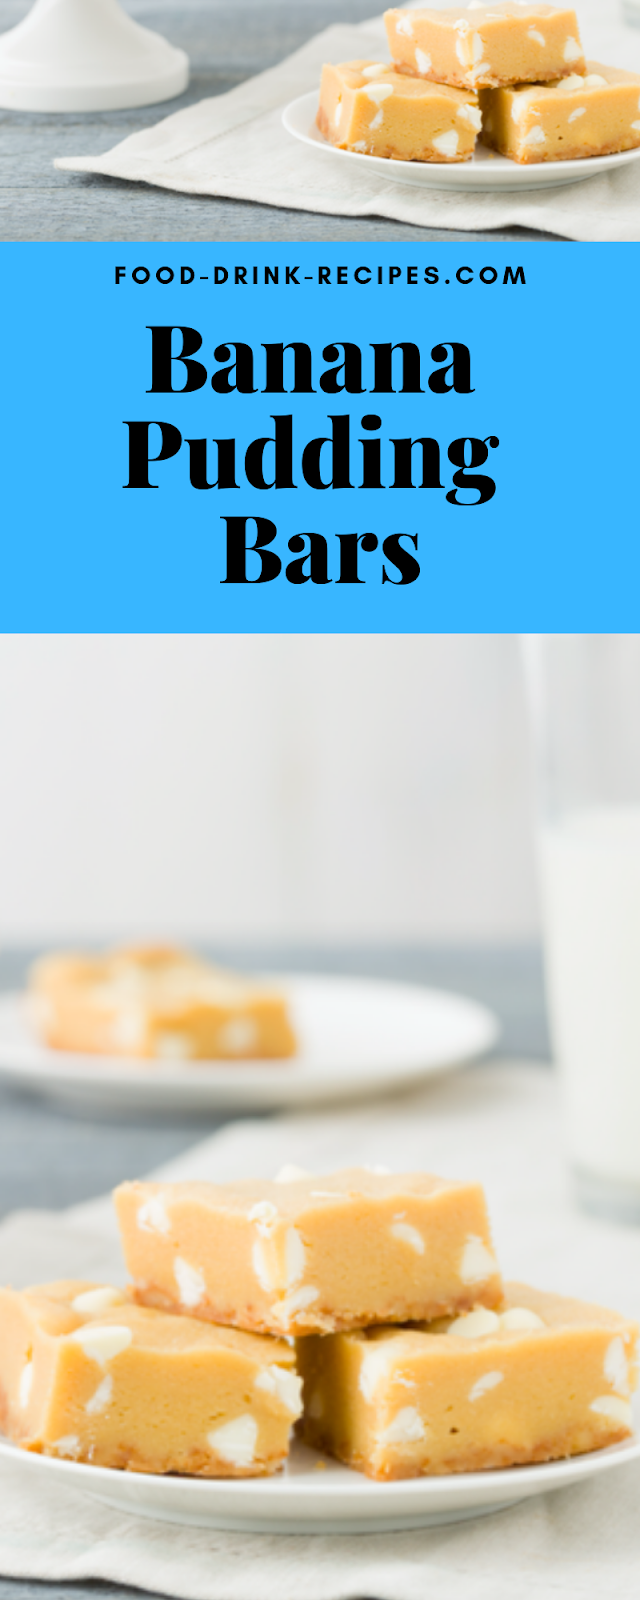 Banana Pudding Bars - food-drink-recipes.com